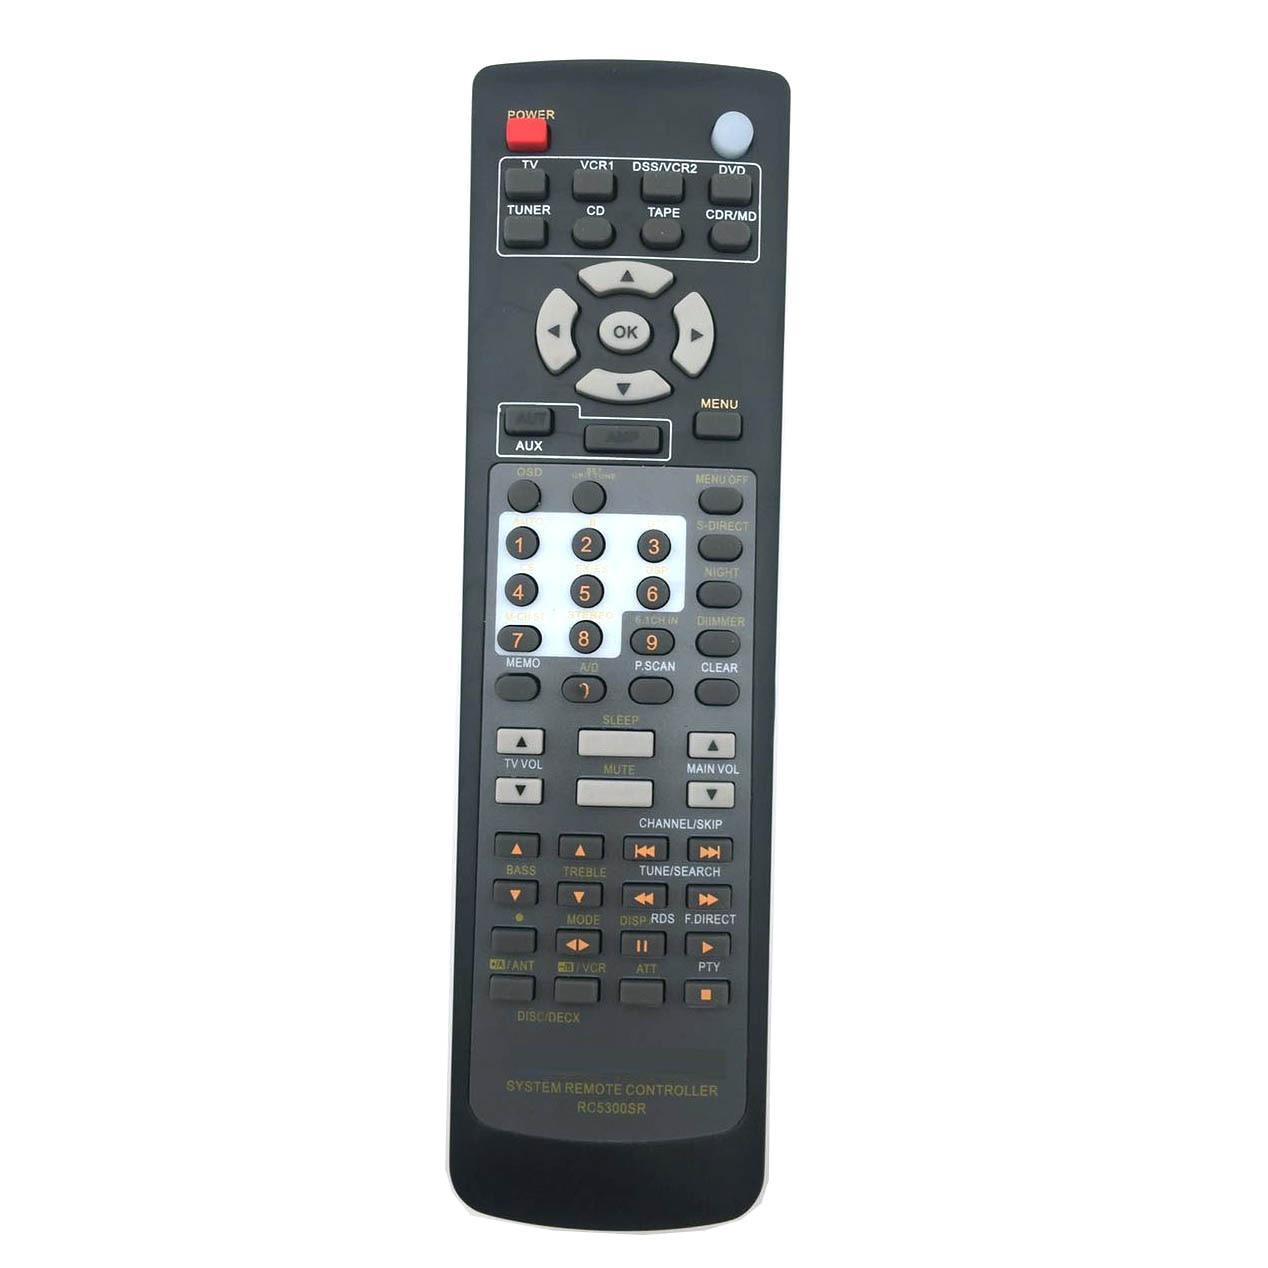 New Remote Control Marantz SR4200 SR4300 SR4400 SR4600 SR5200 SR5300 SR5400 SR5500 RC5200SR RC5300SR RC5400SR RC5600SR SR6200